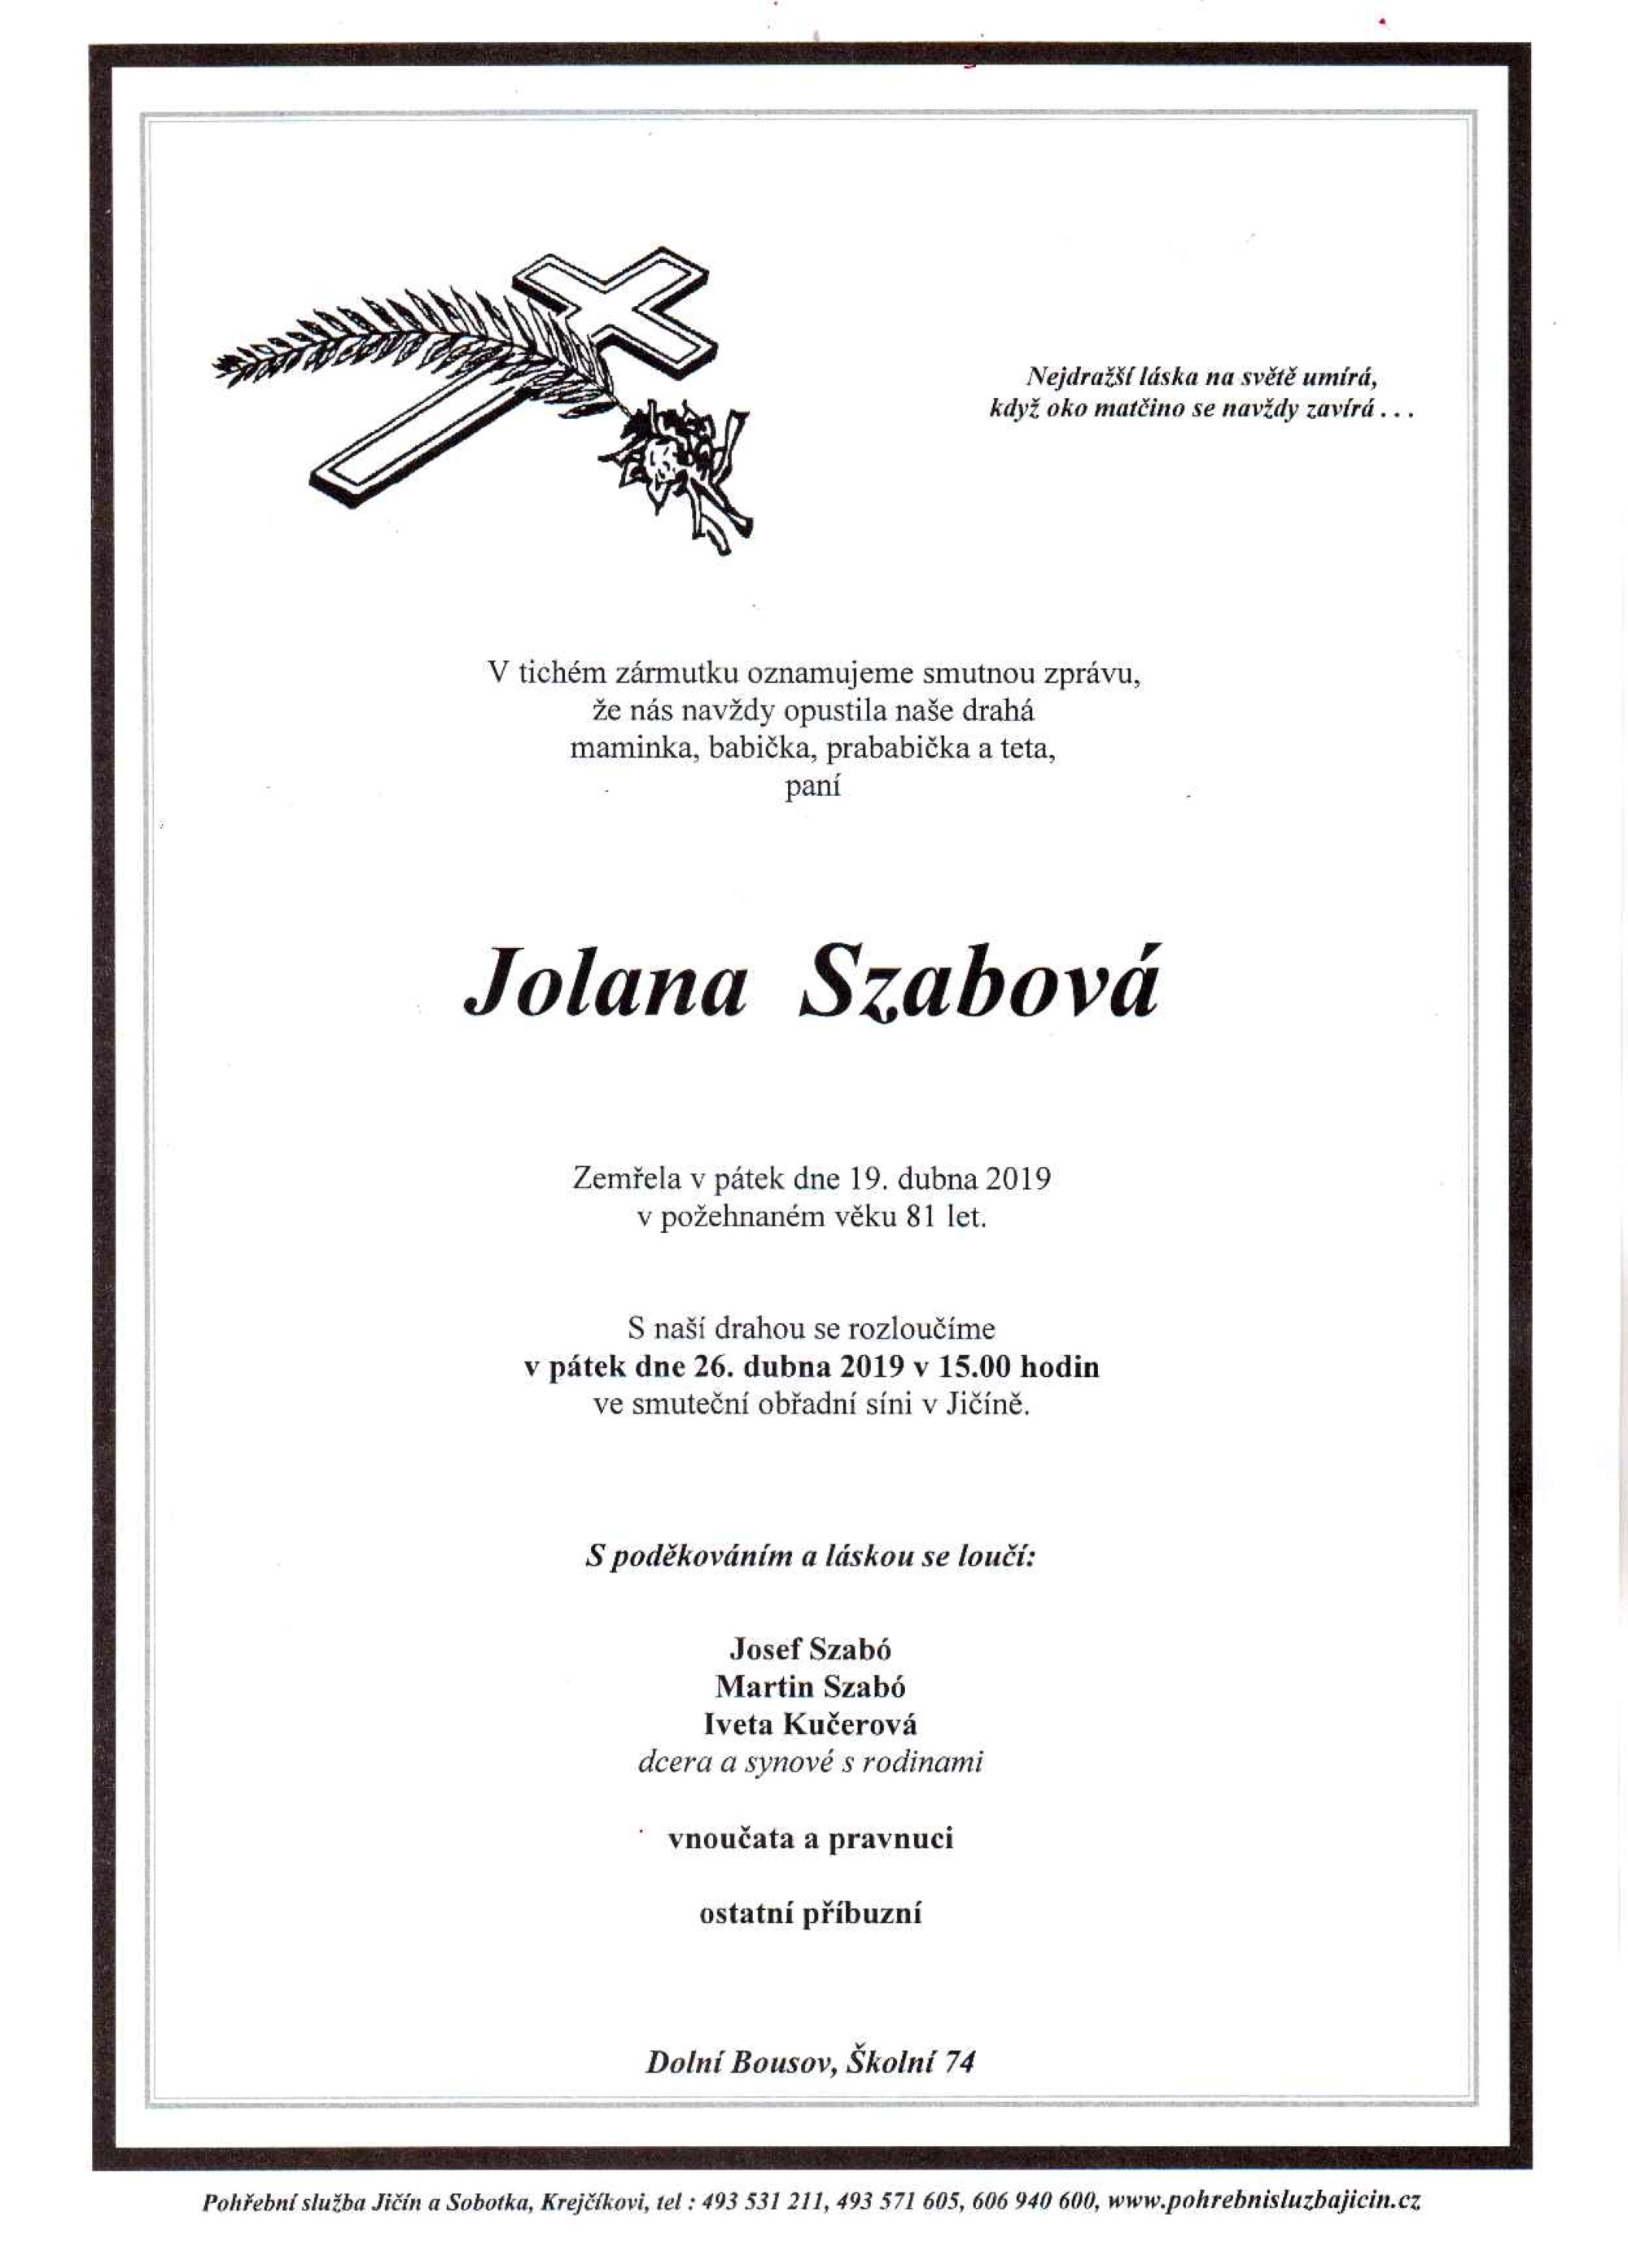 Jolana Szabová